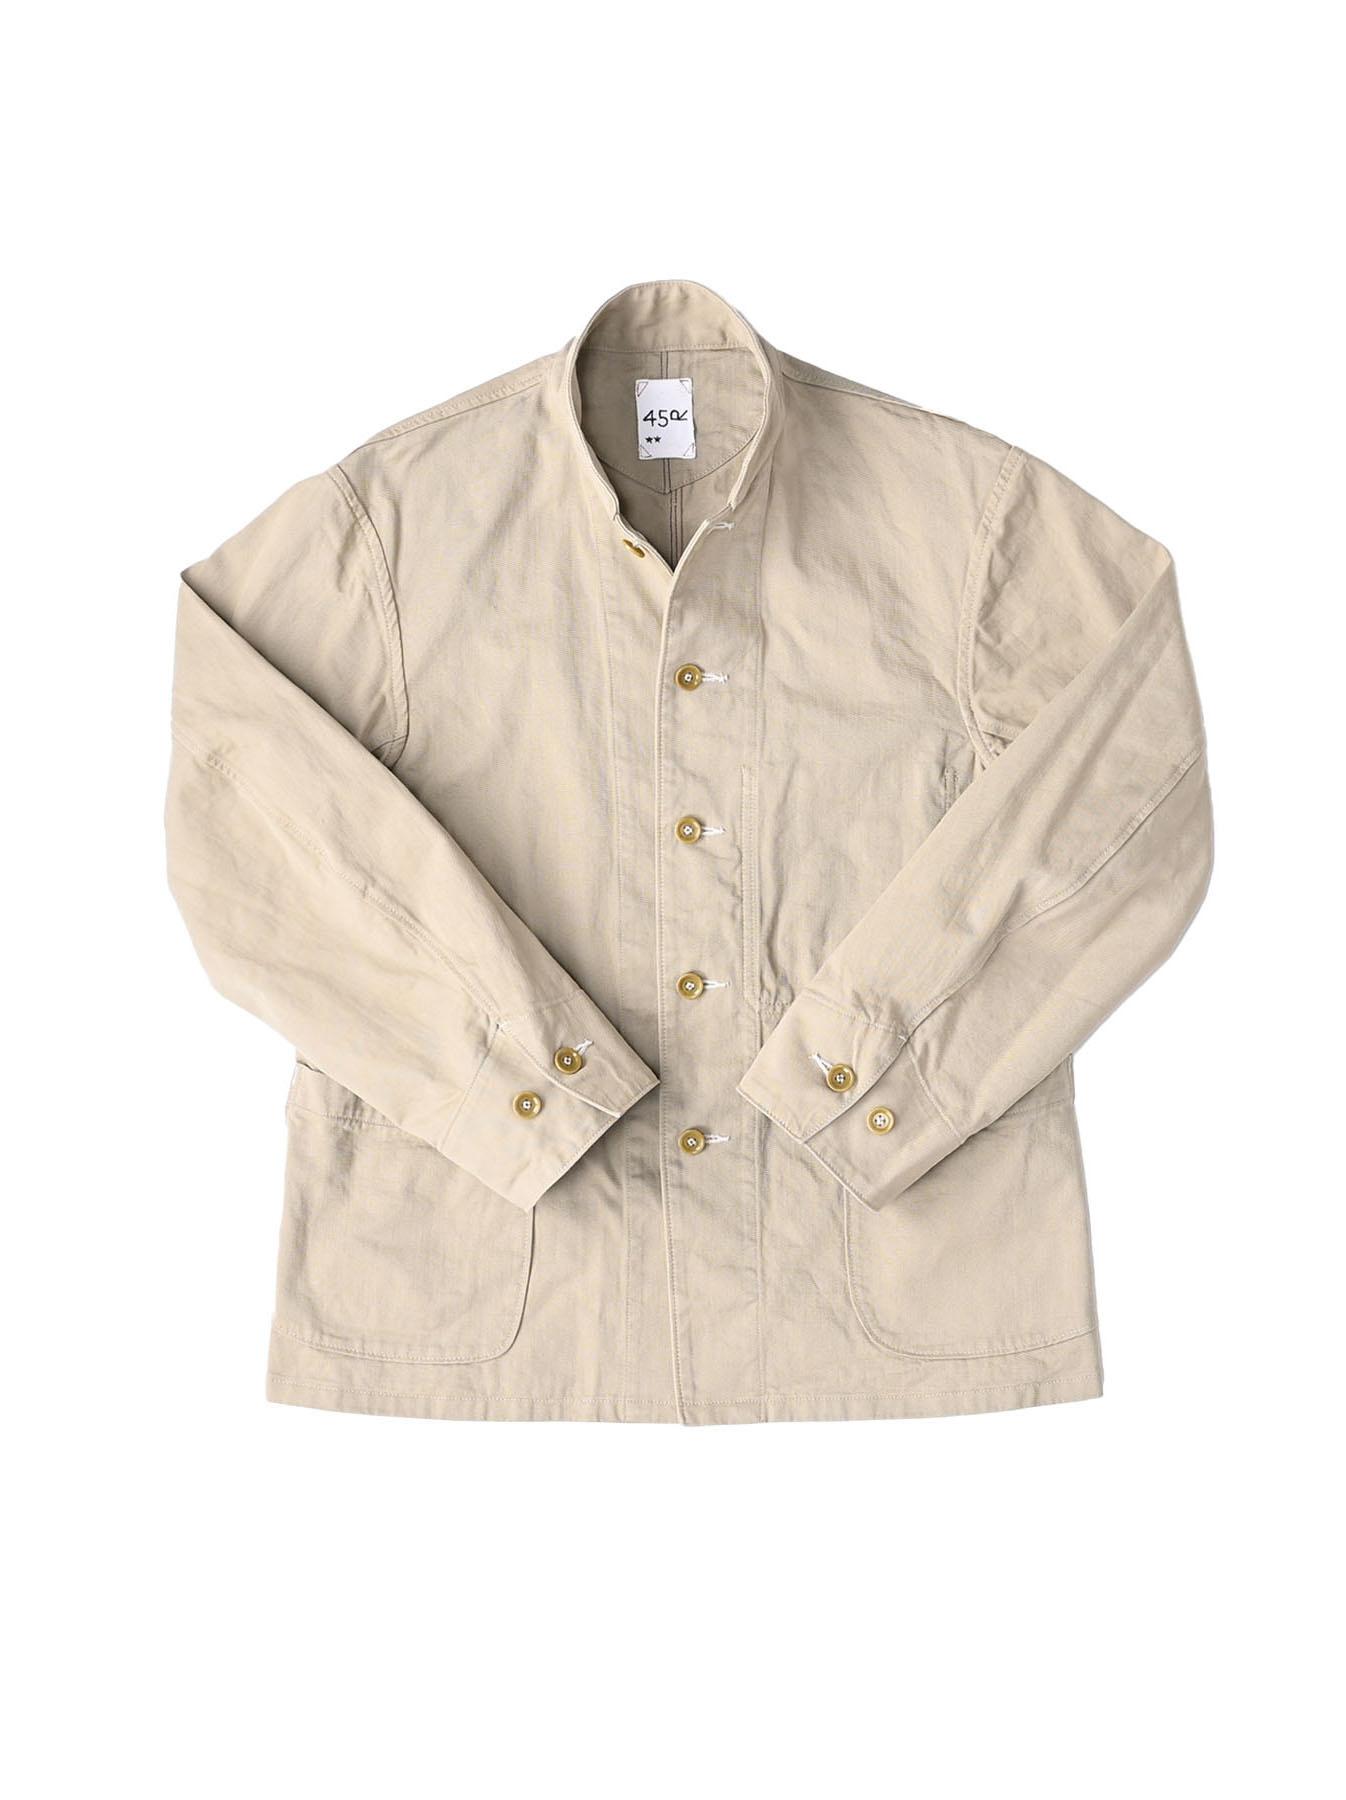 Okome Chino 908 Shirt Jacket-1